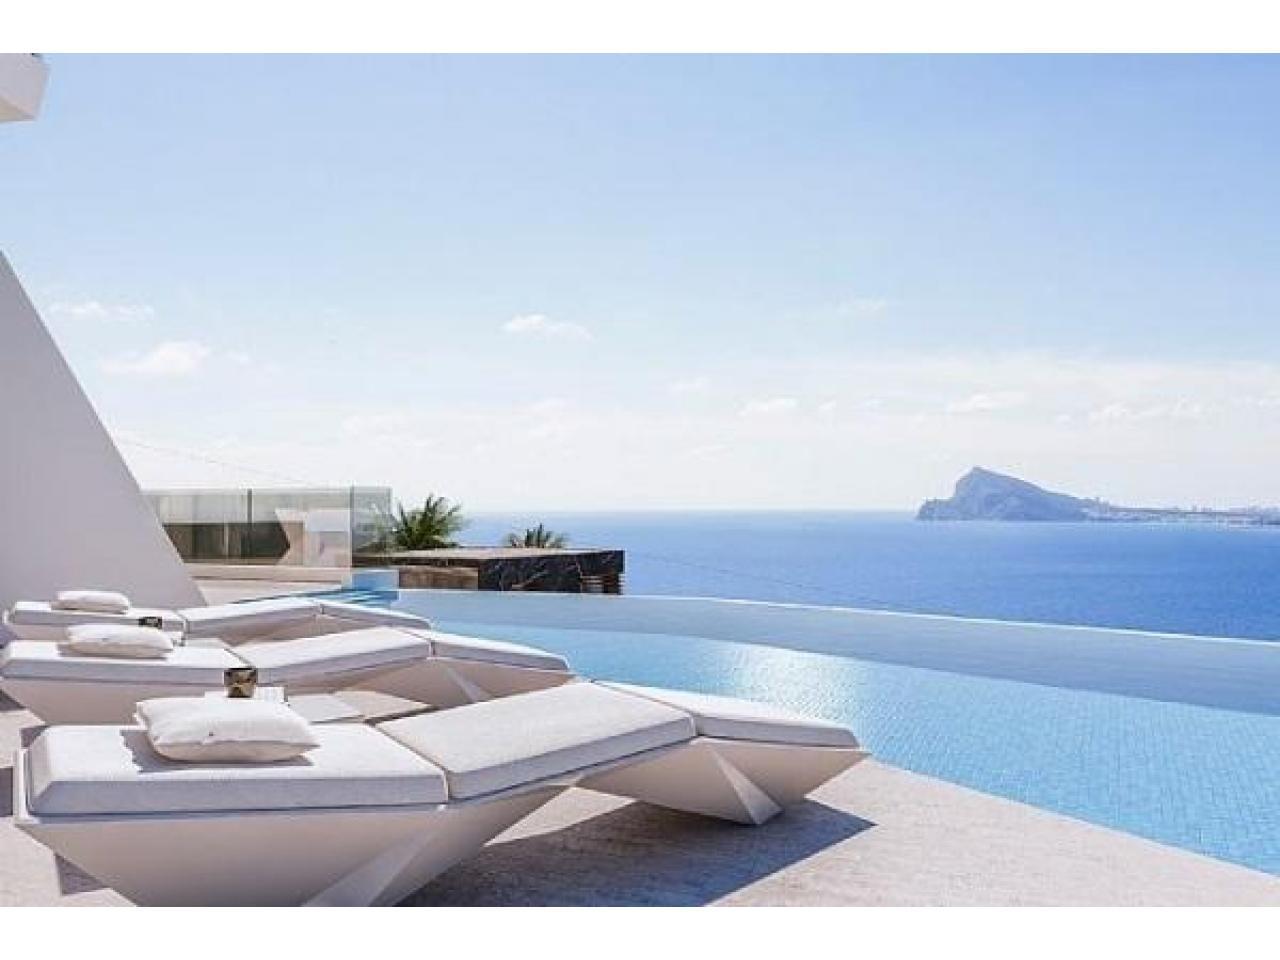 Недвижимость в Испании, Новая вилла с видами на море от застройщика в Альтеа,Коста Бланка,Испания - 10